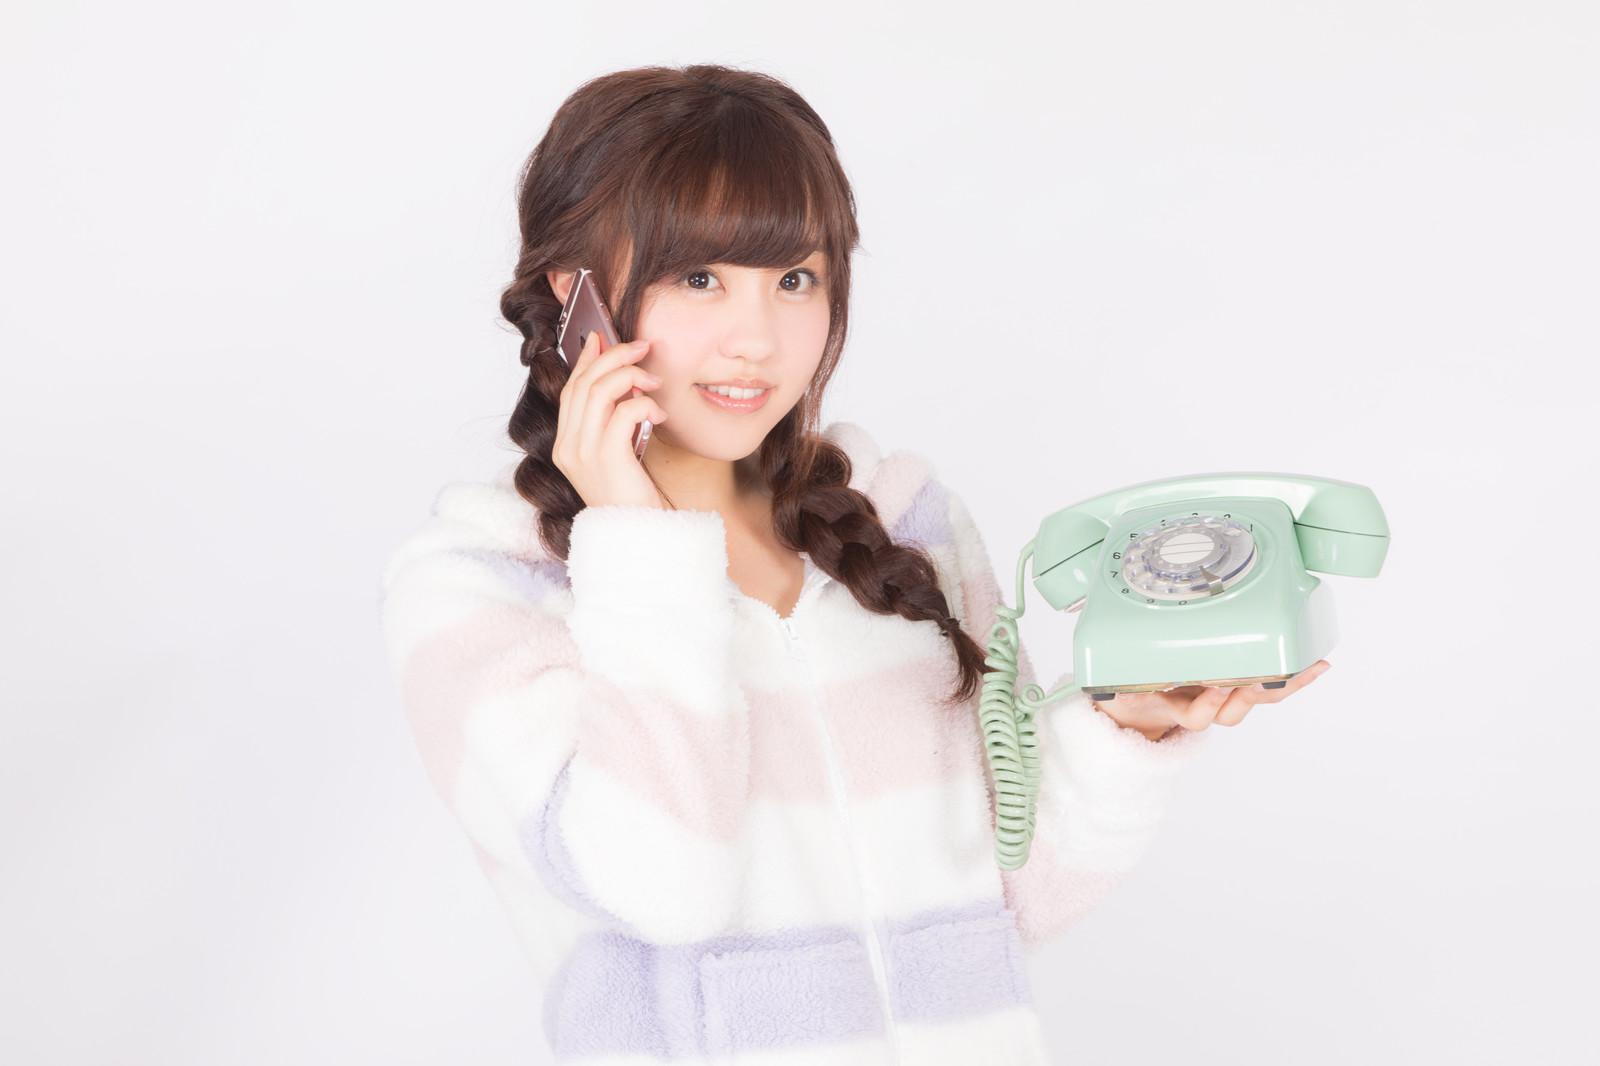 Yuka-Calling-Somebody-on-a-phone-pakutaso.jpg